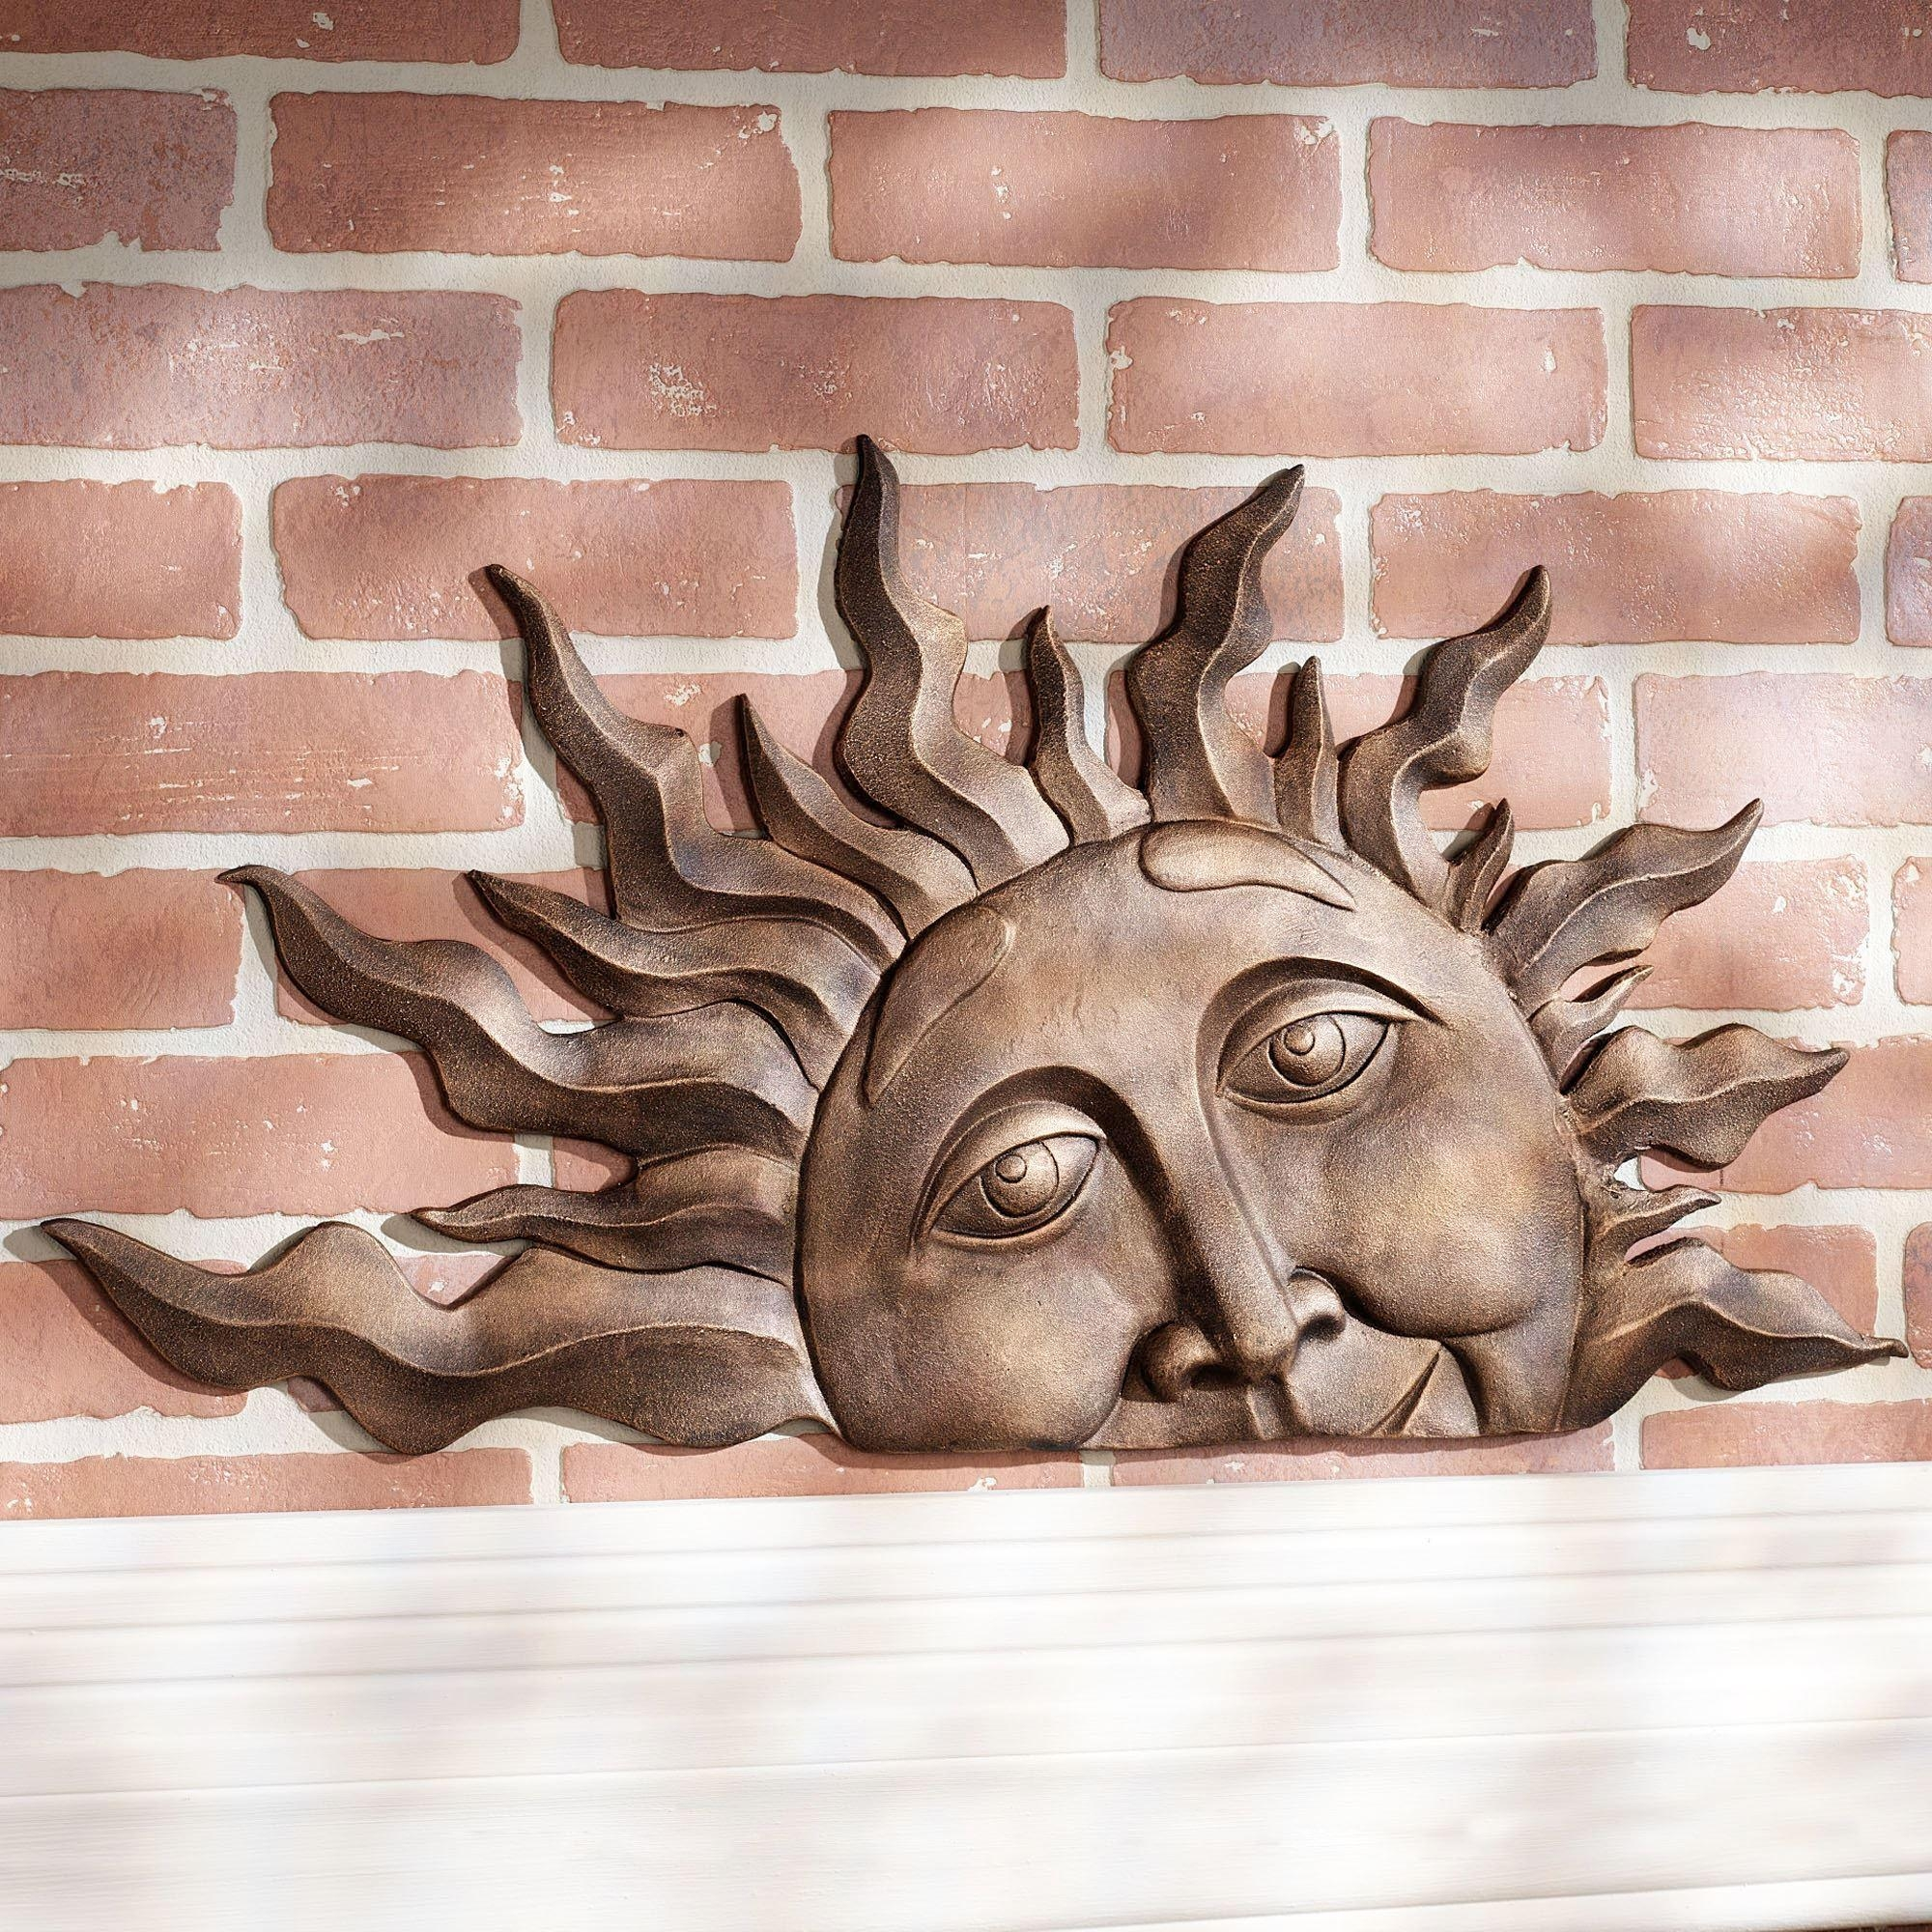 Half Sun Face Indoor Outdoor Metal Wall Plaque Art Intended For Outdoor Wall Sculpture Art (View 8 of 20)